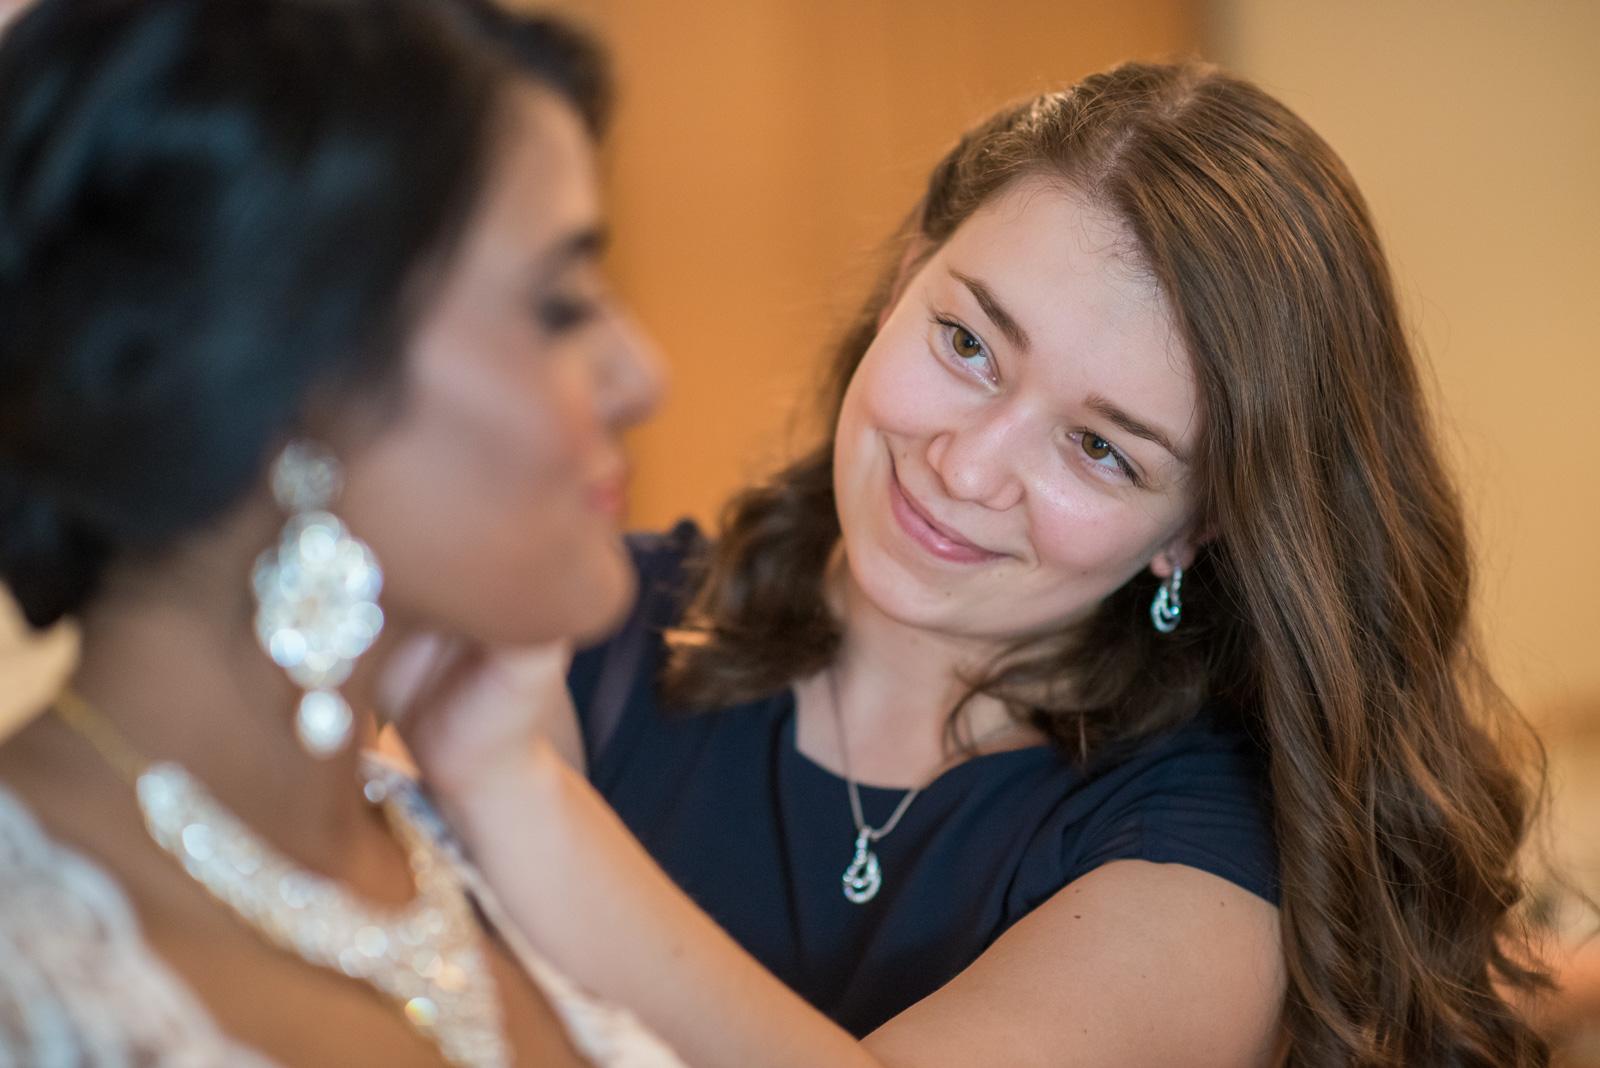 bc-wedding-photographers-paradise-banquet-hall-wedding-7.jpg